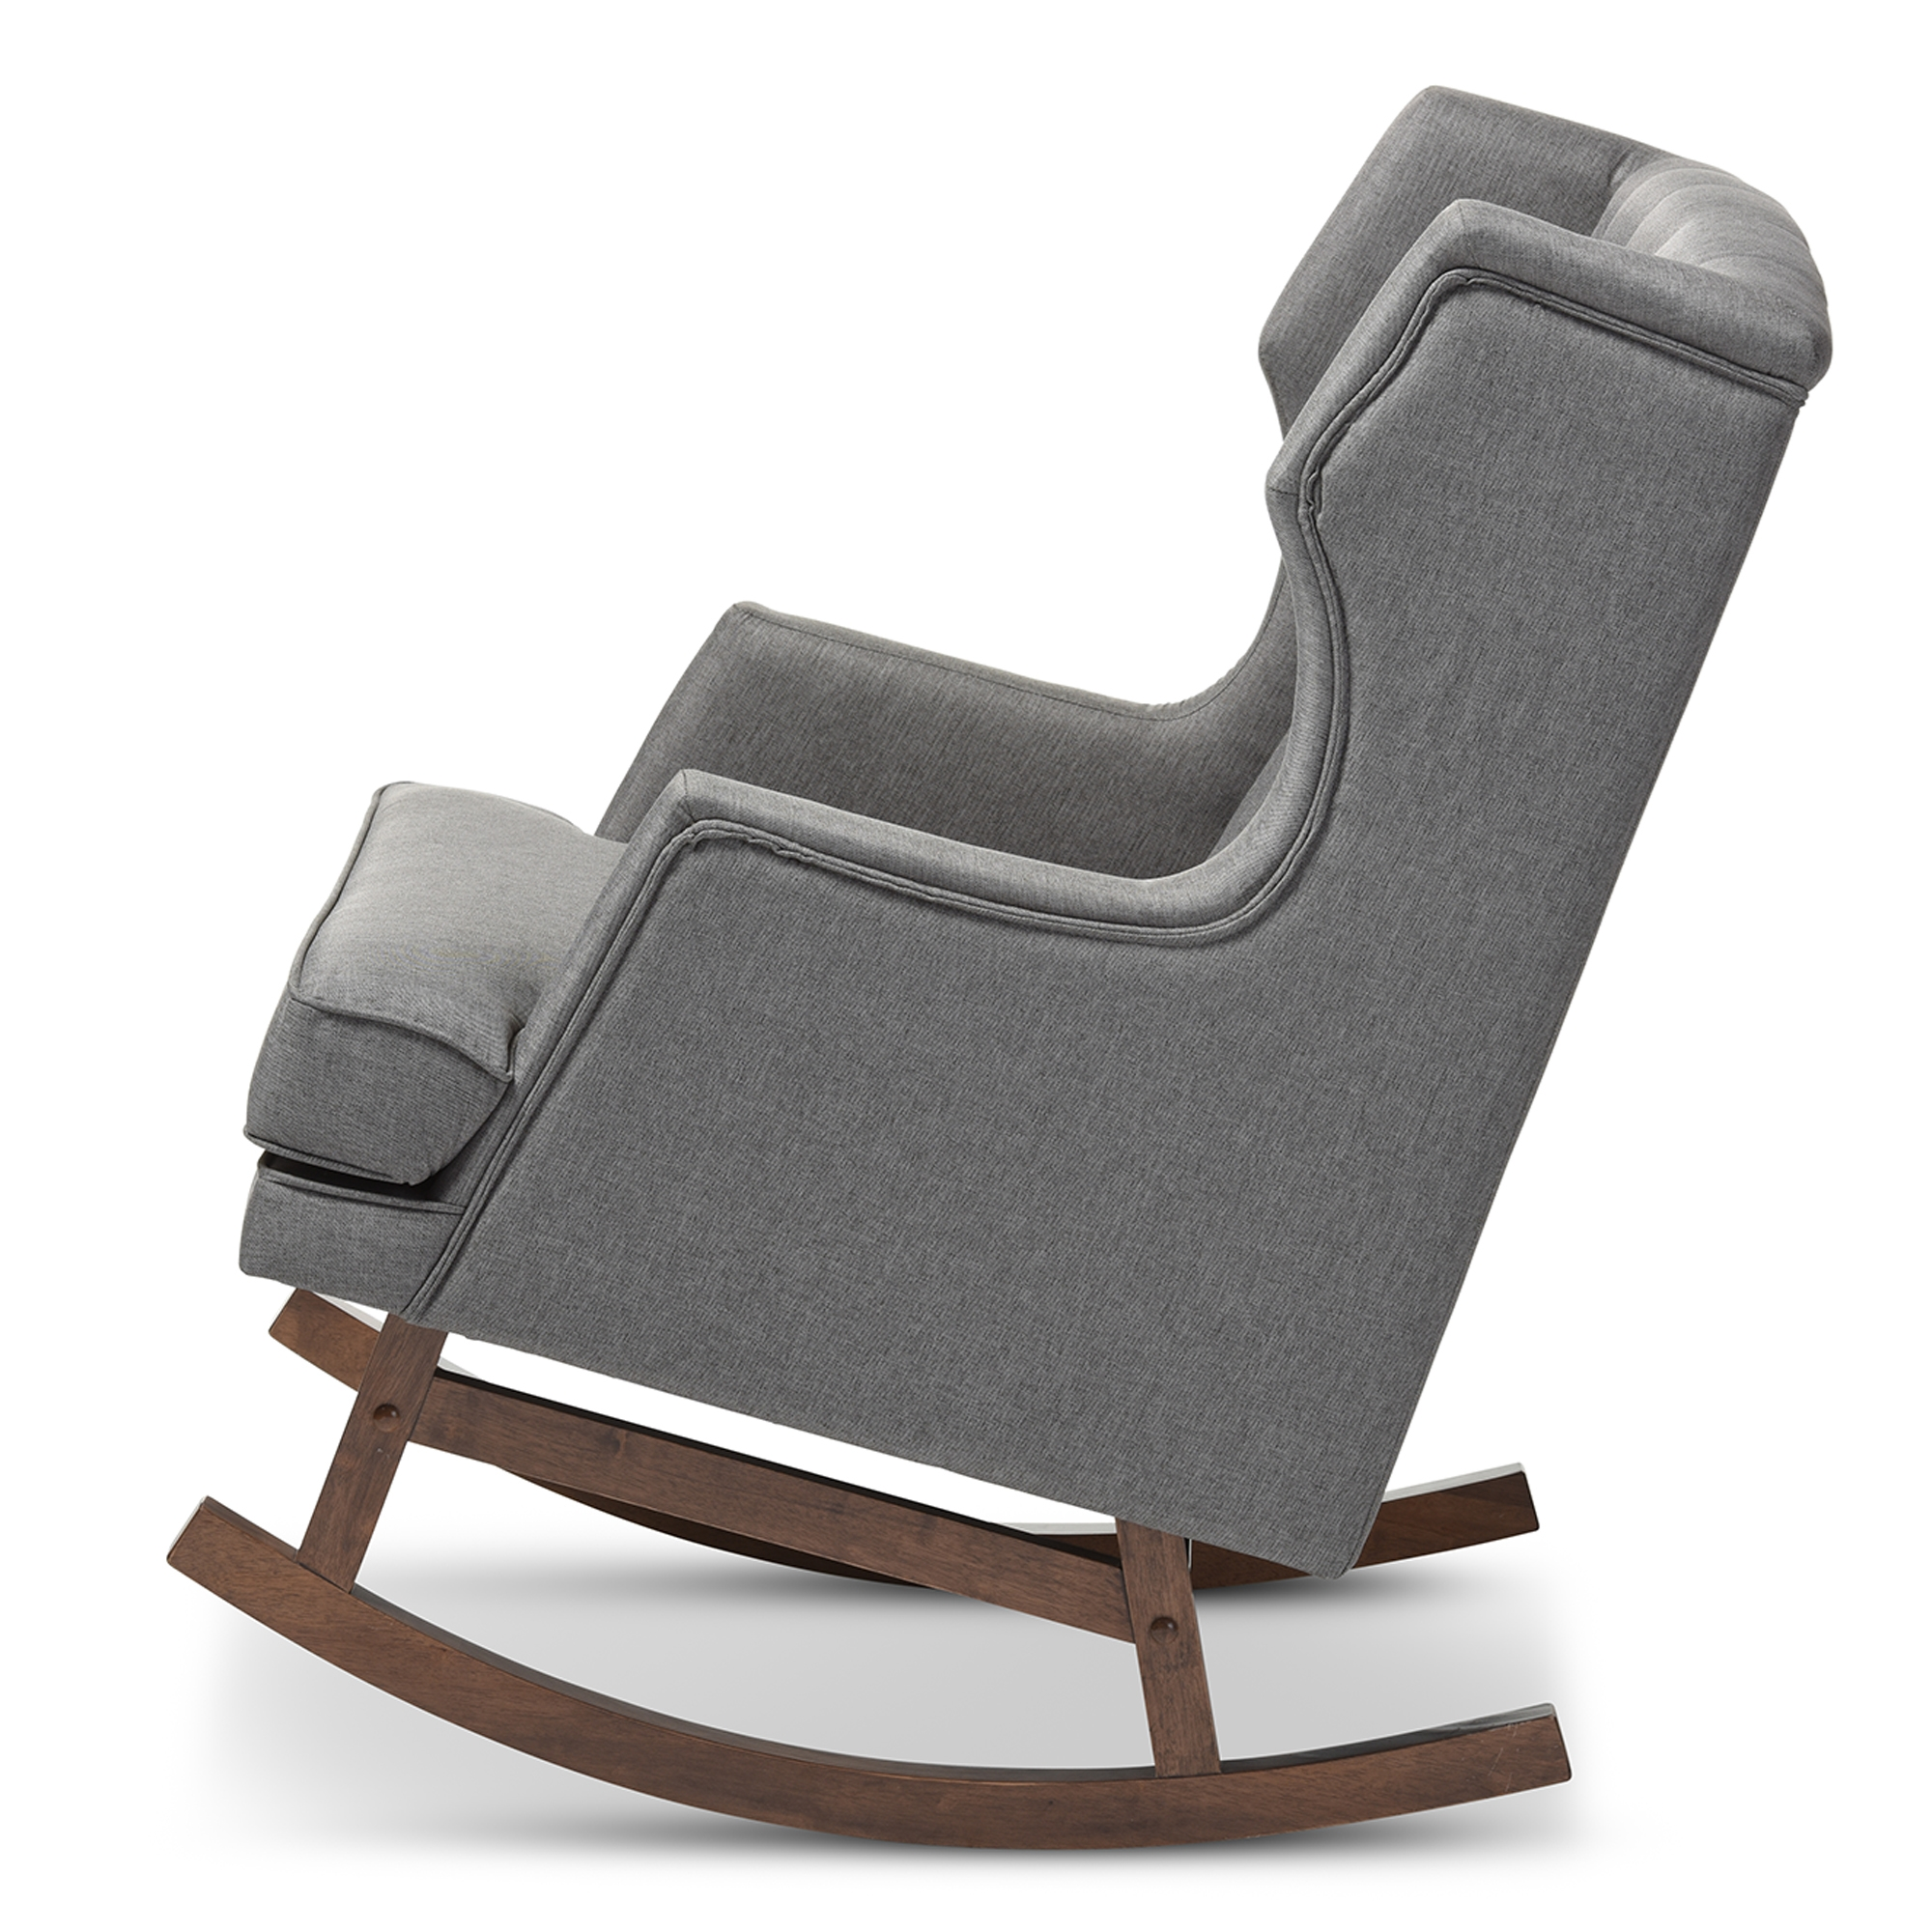 ... Baxton Studio Iona Mid Century Retro Modern Grey Fabric Upholstered  Button Tufted Wingback Rocking ...